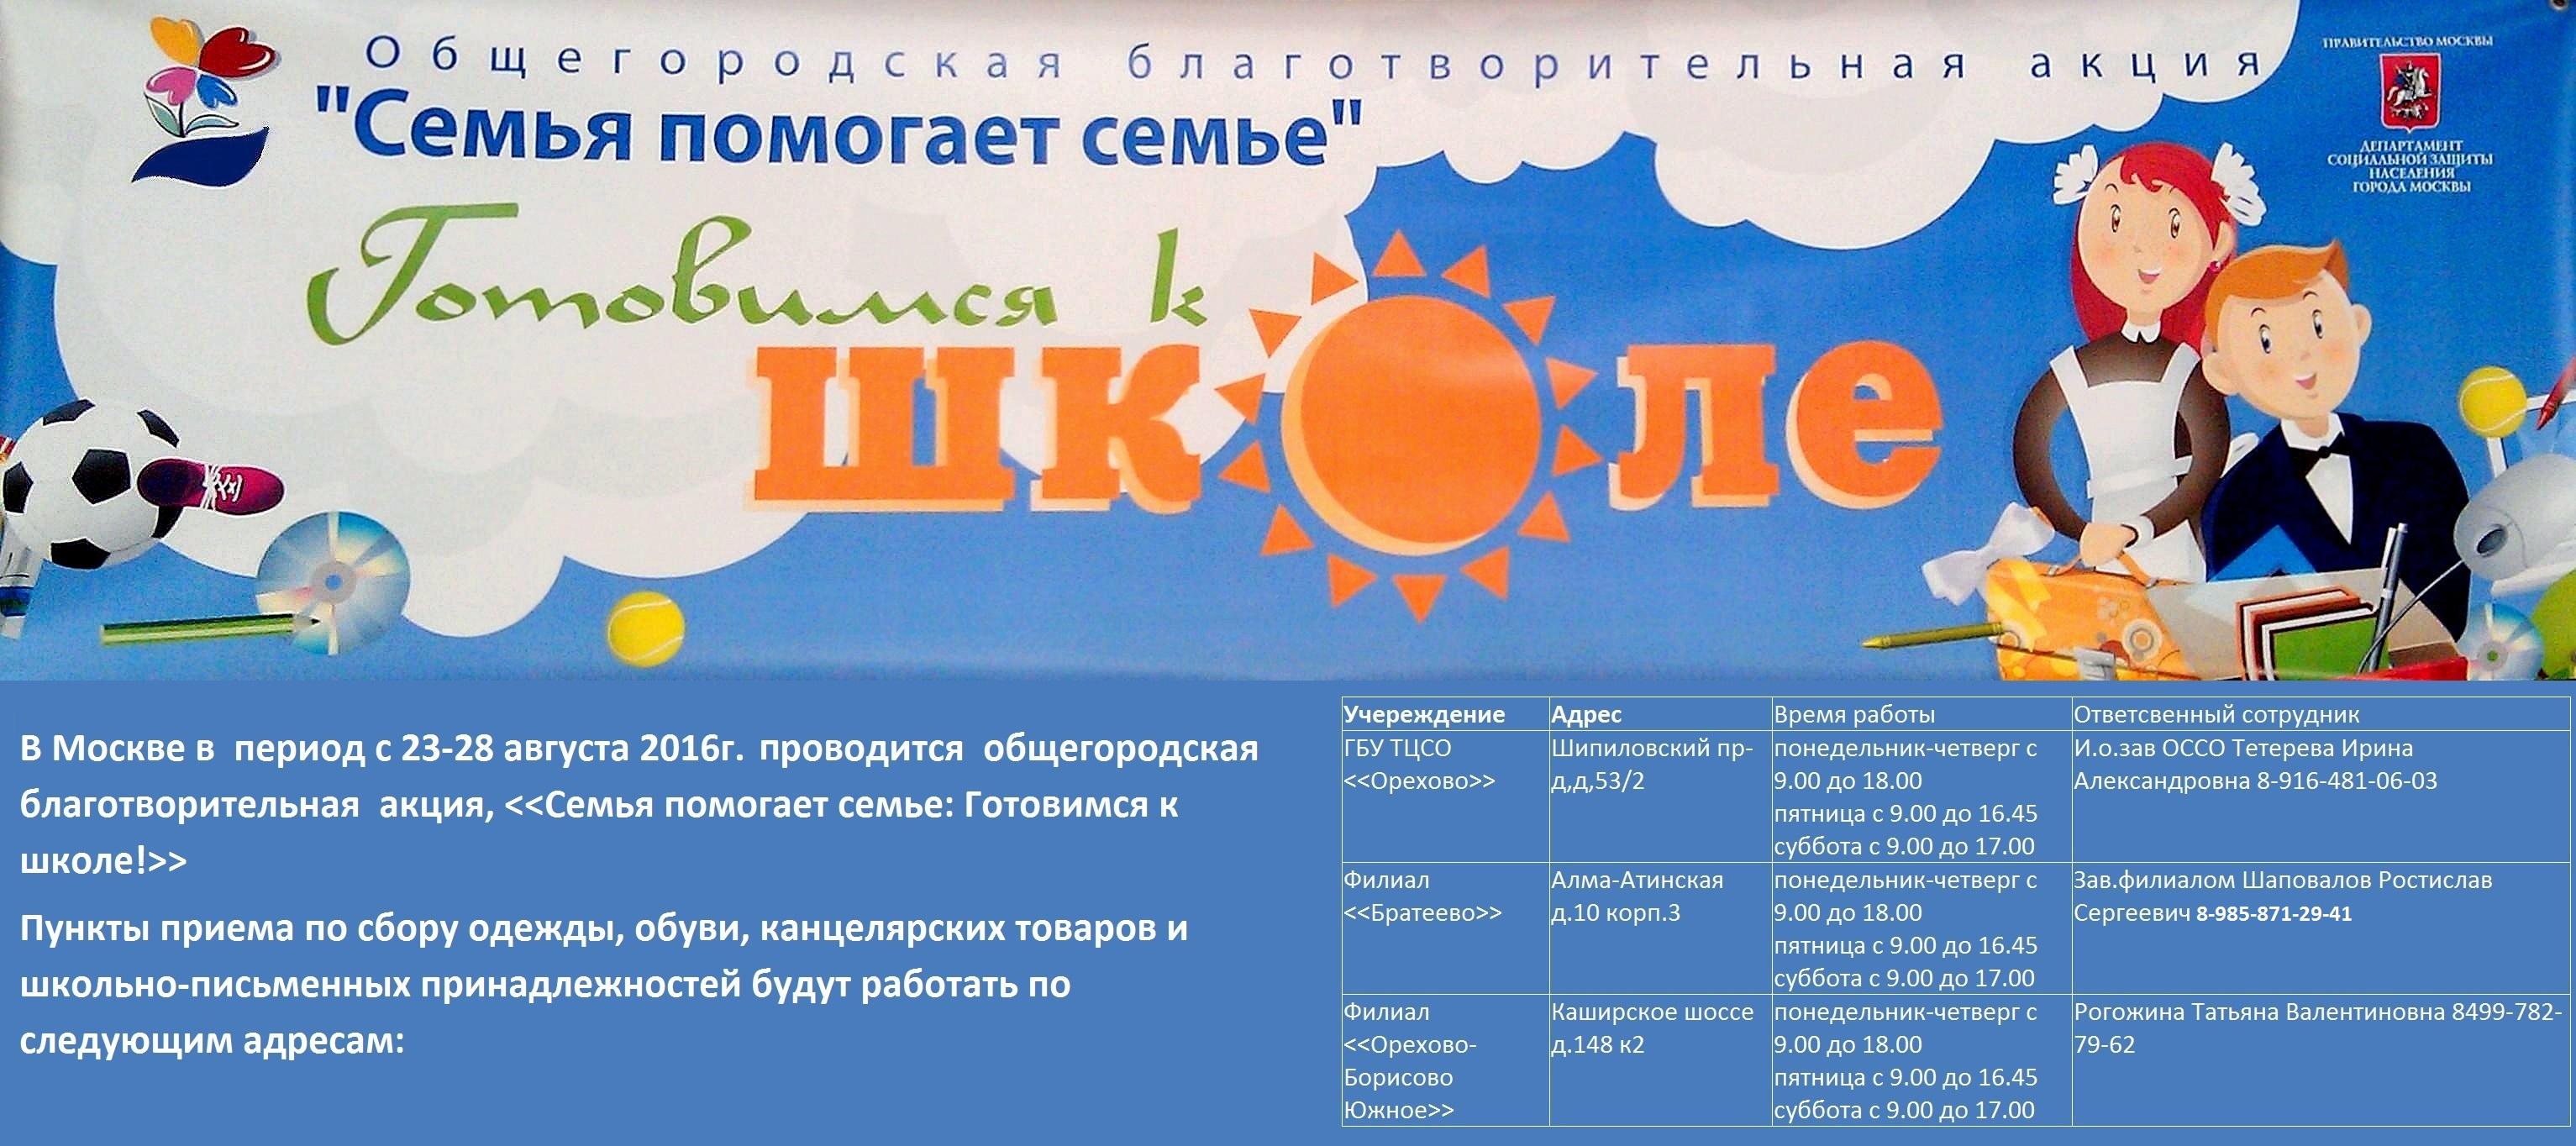 Banner-Semya-pomogaet-seme.-300h50-1-sht.